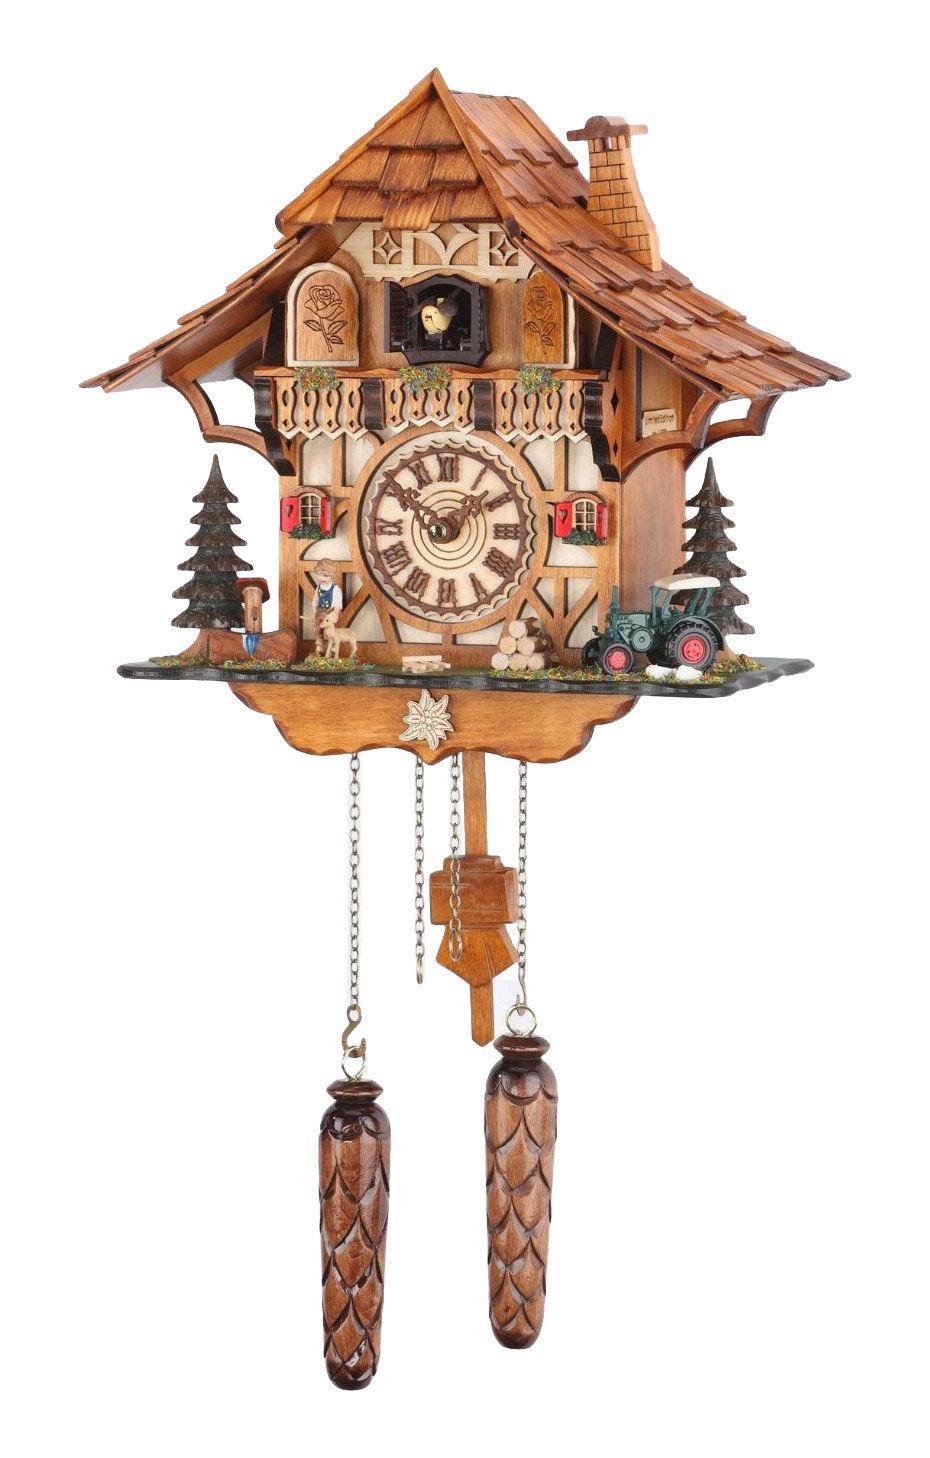 Часы настенные Часы настенные с кукушкой Trenkle 482 QM HZZG chasy-nastennye-s-kukushkoy-trenkle-482-qm-hzzg-germaniya.jpg